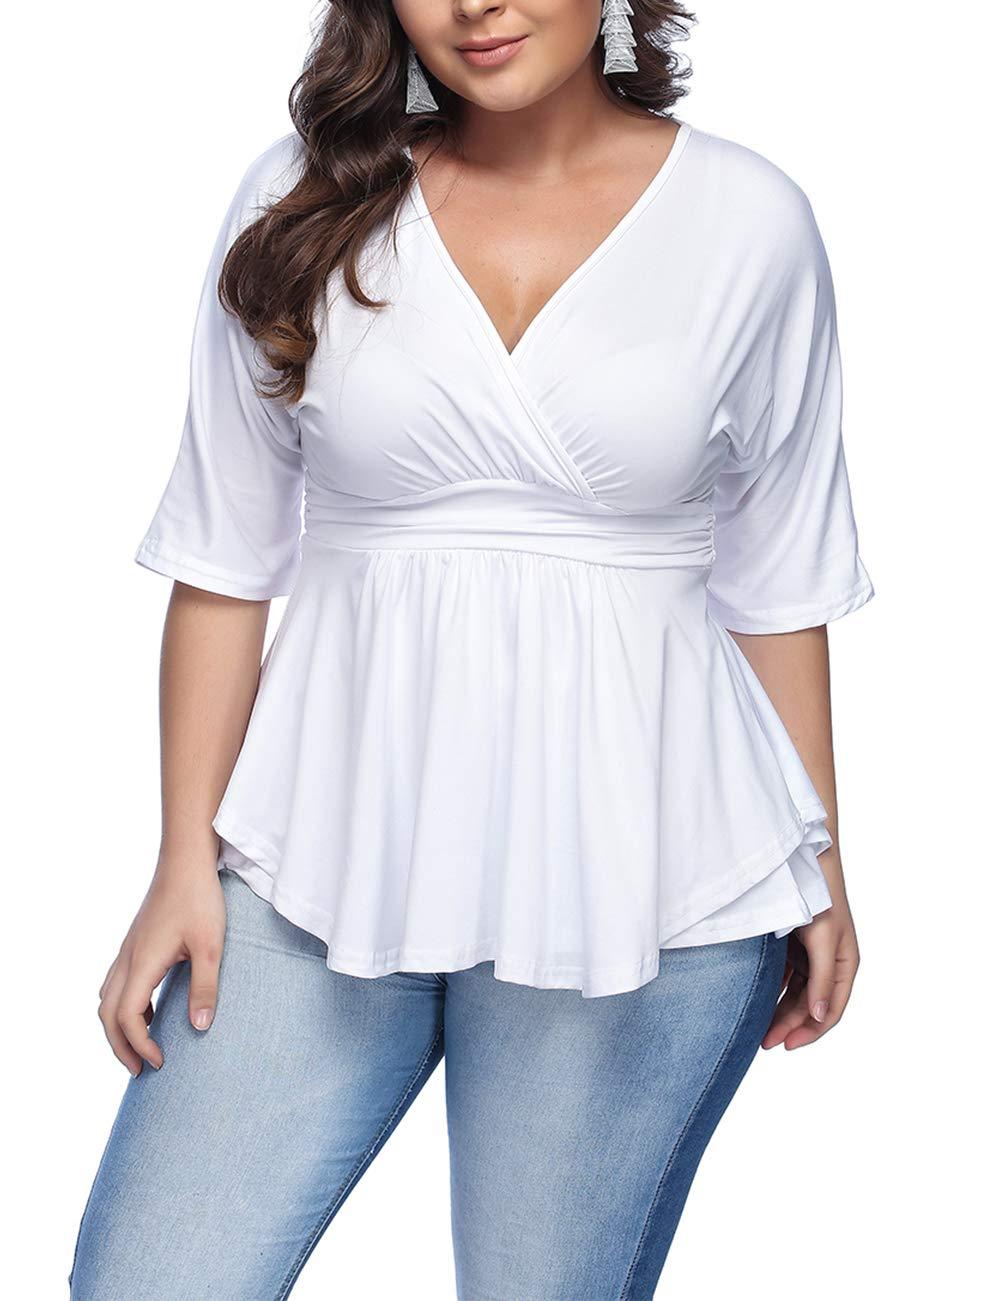 KUREAS Women's Plus Size Tops Deep V Neck T-Shirts Half Sleeve Ruched Knit Tee